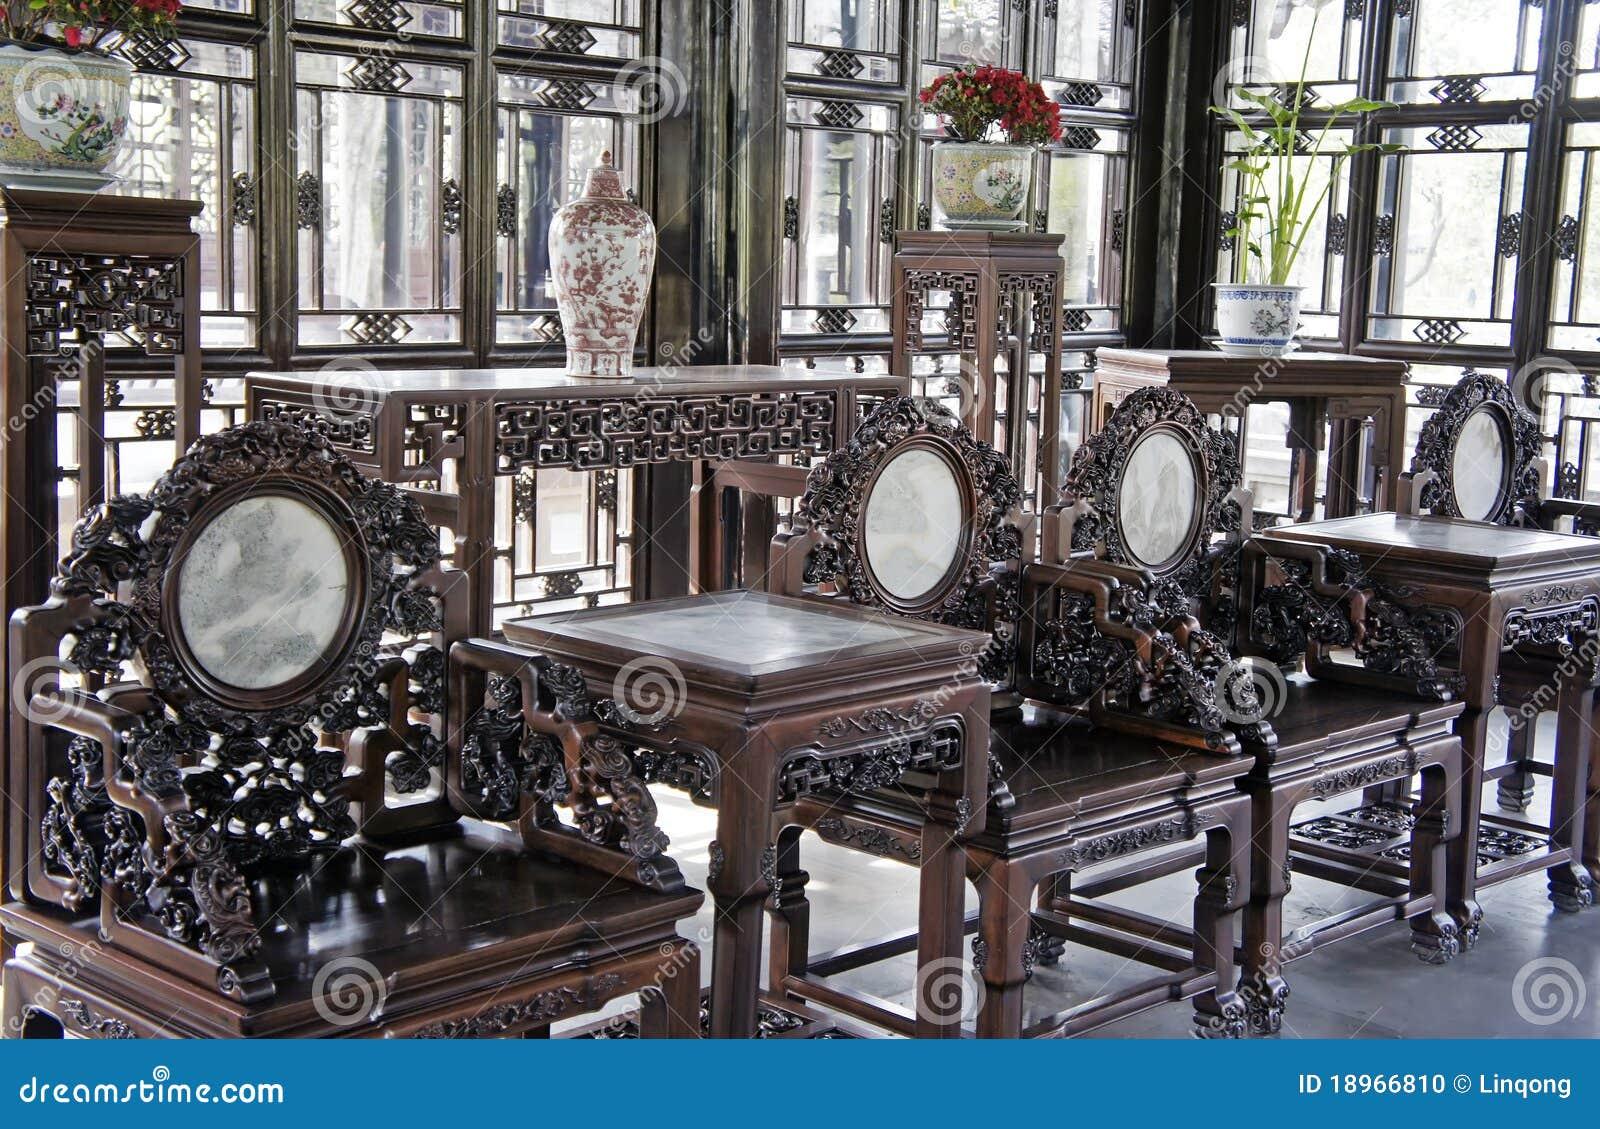 Chinese Antique Furniture Stock Photo Image 18966810